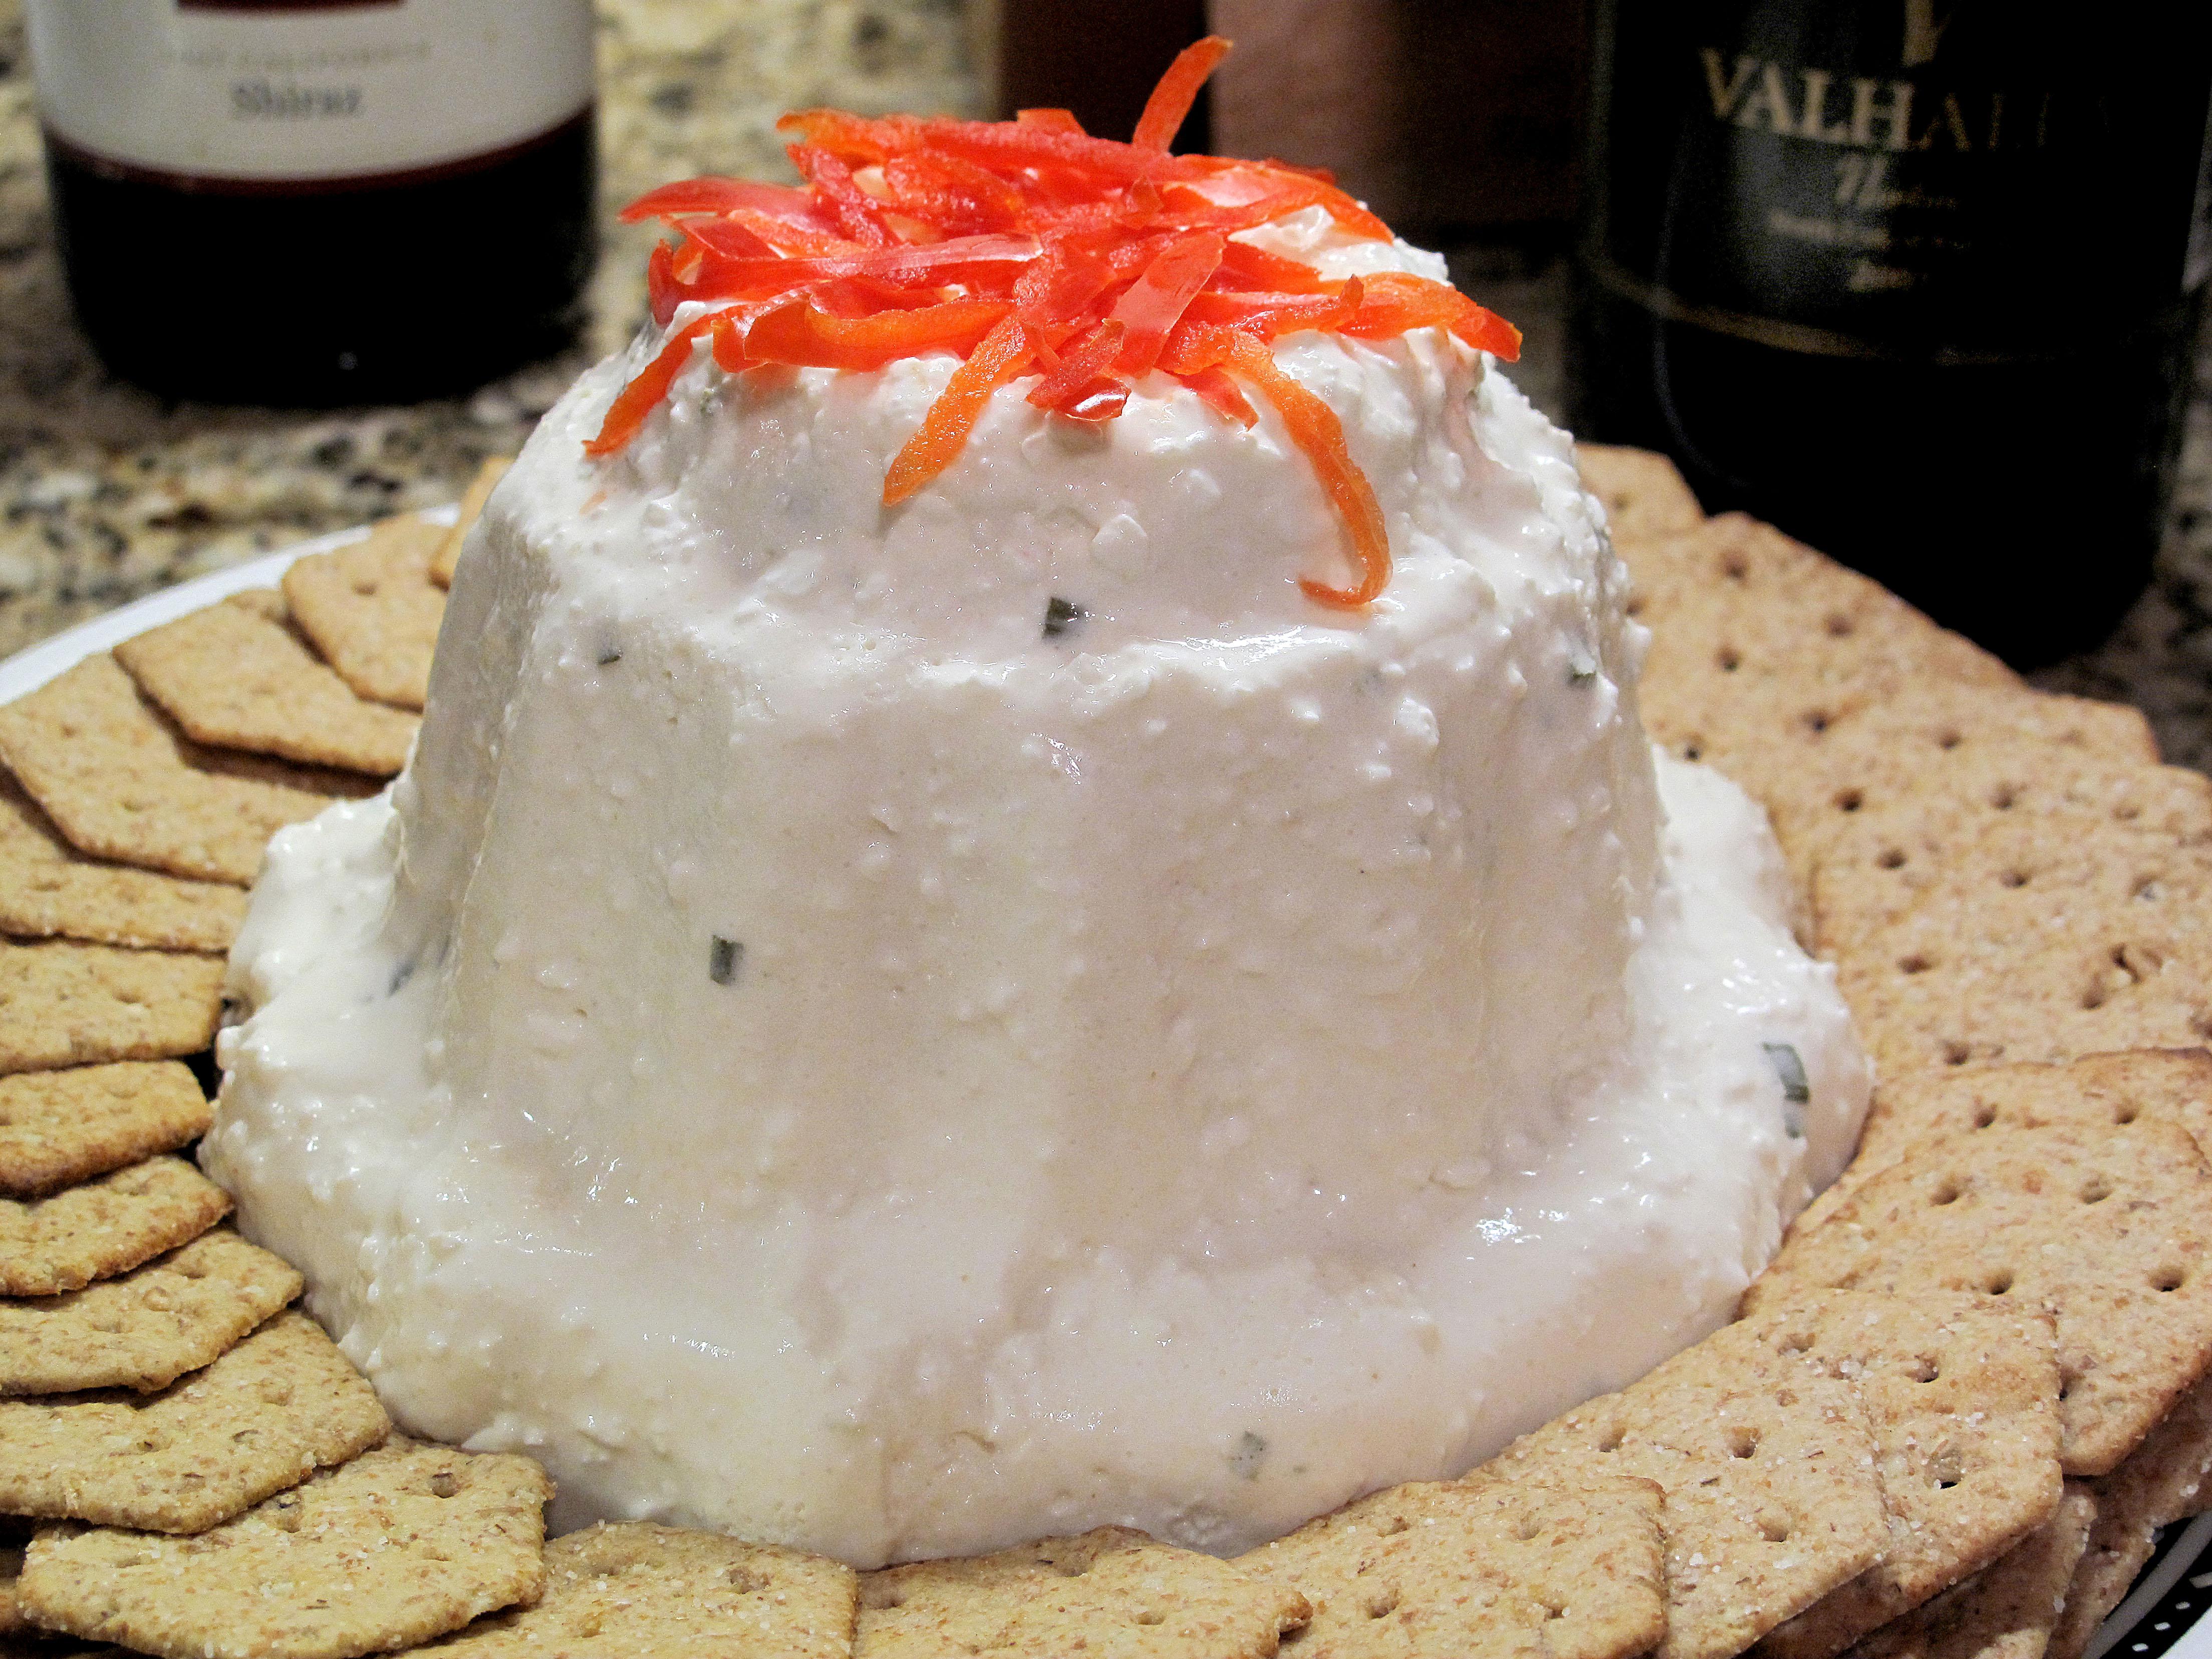 Savory Cheese Mold